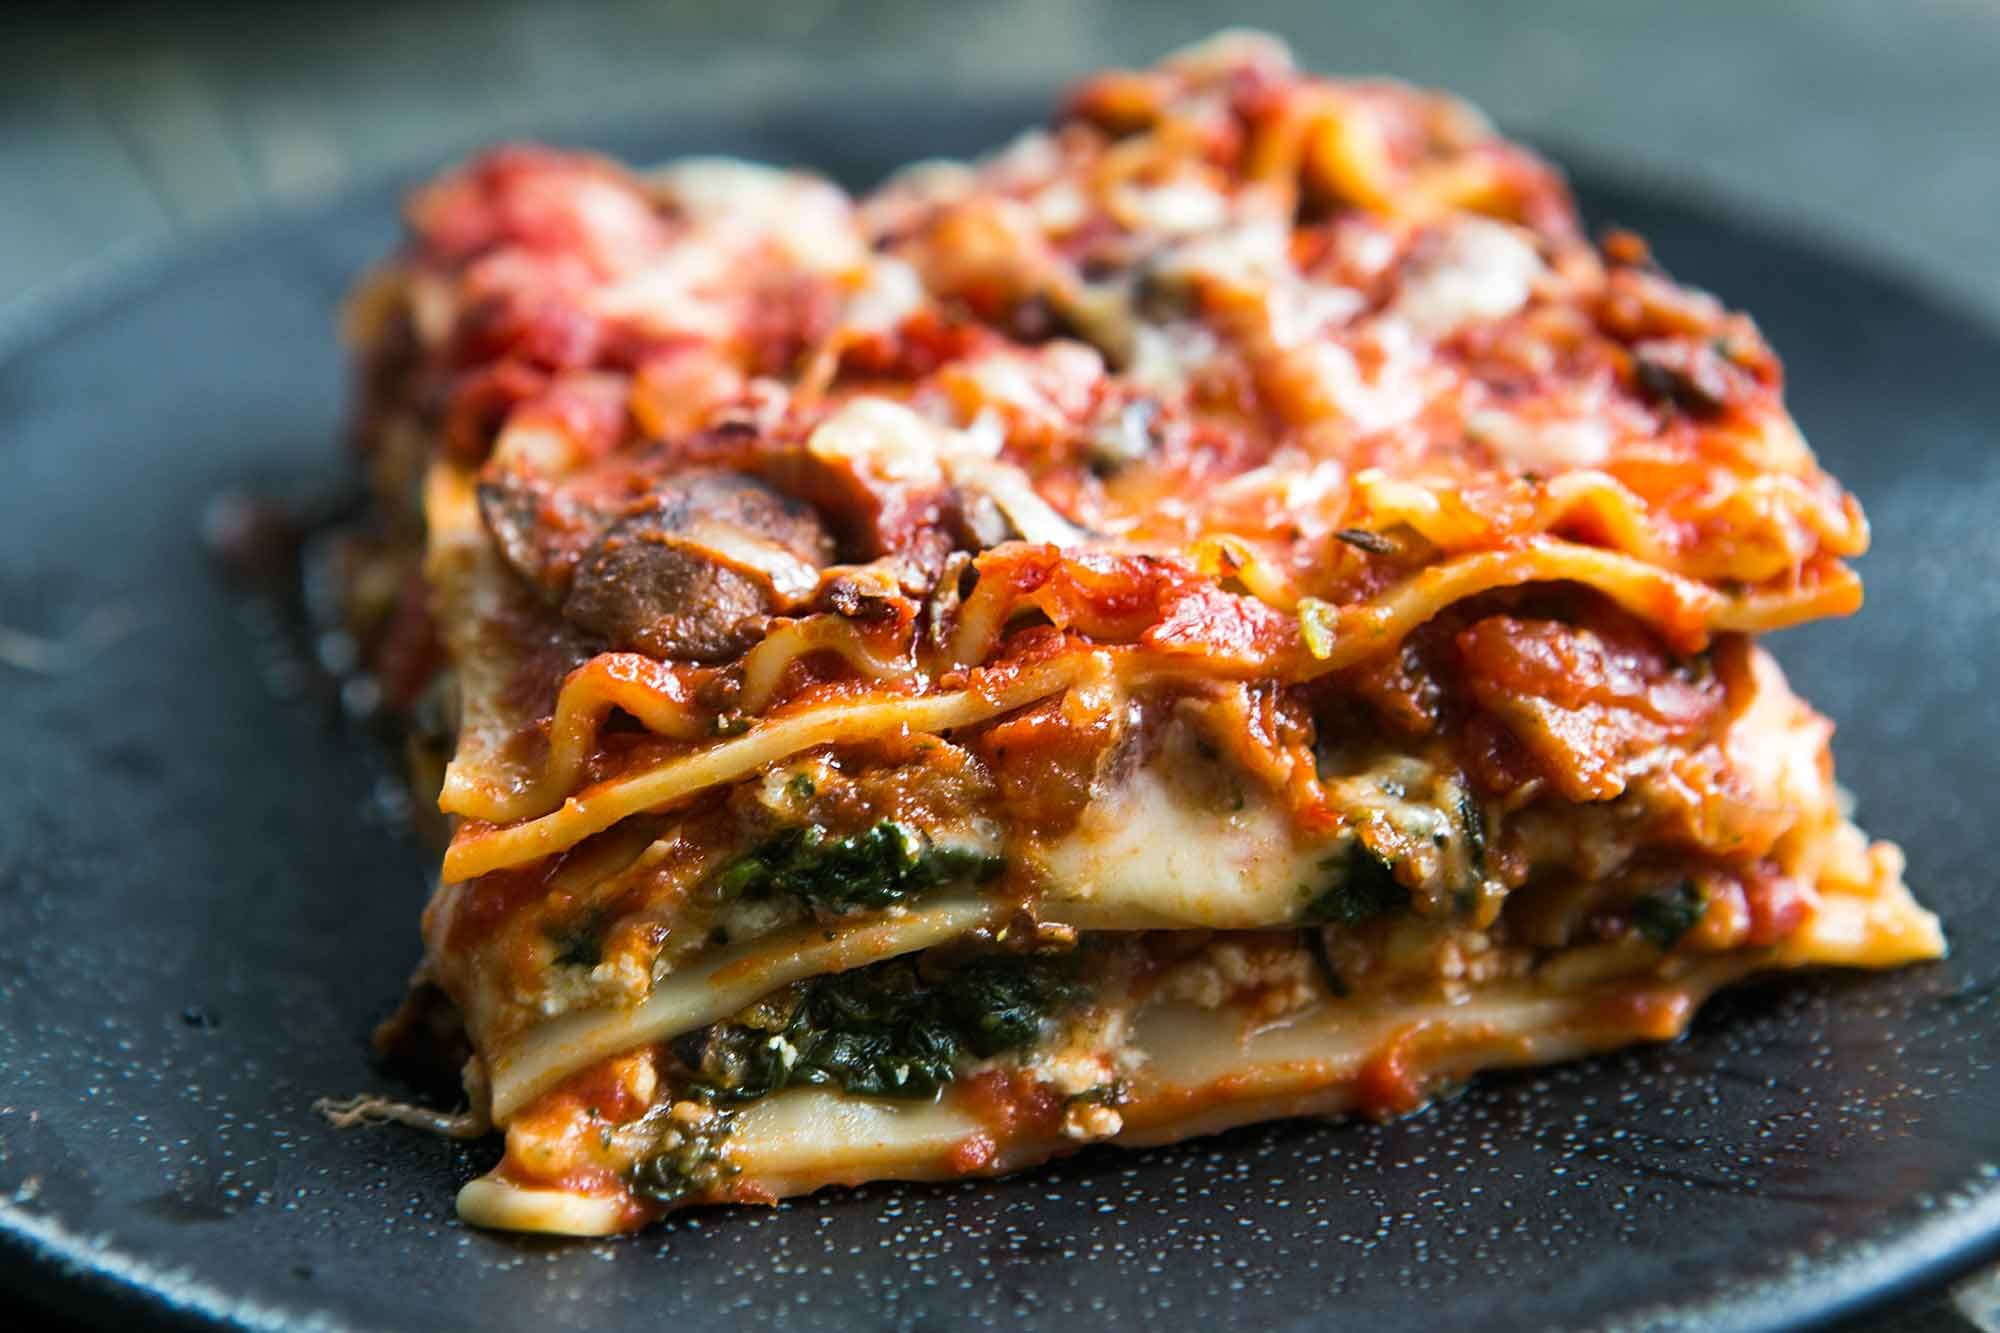 Ricetta Lasagne.Ricetta Lasagne Ai Funghi Il Club Delle Ricette Ricetta Ricette Lasagne Vegetariane Lasagna Vegetariana